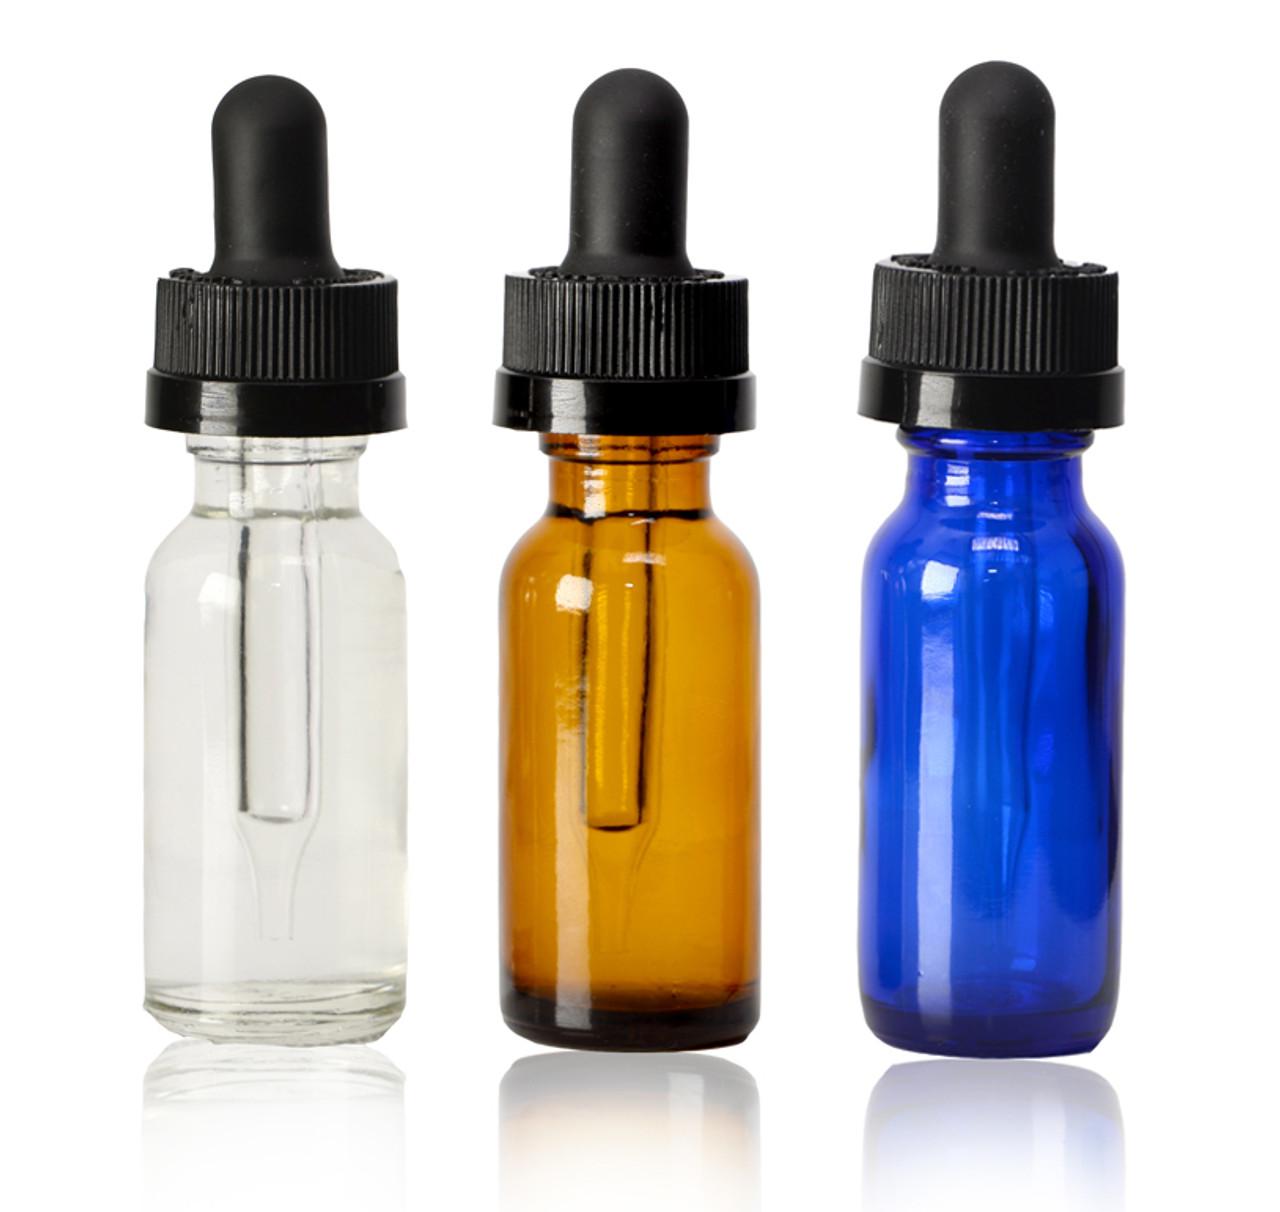 15 ml,1/2 oz Boston Round with Black Child Resistant Dropper